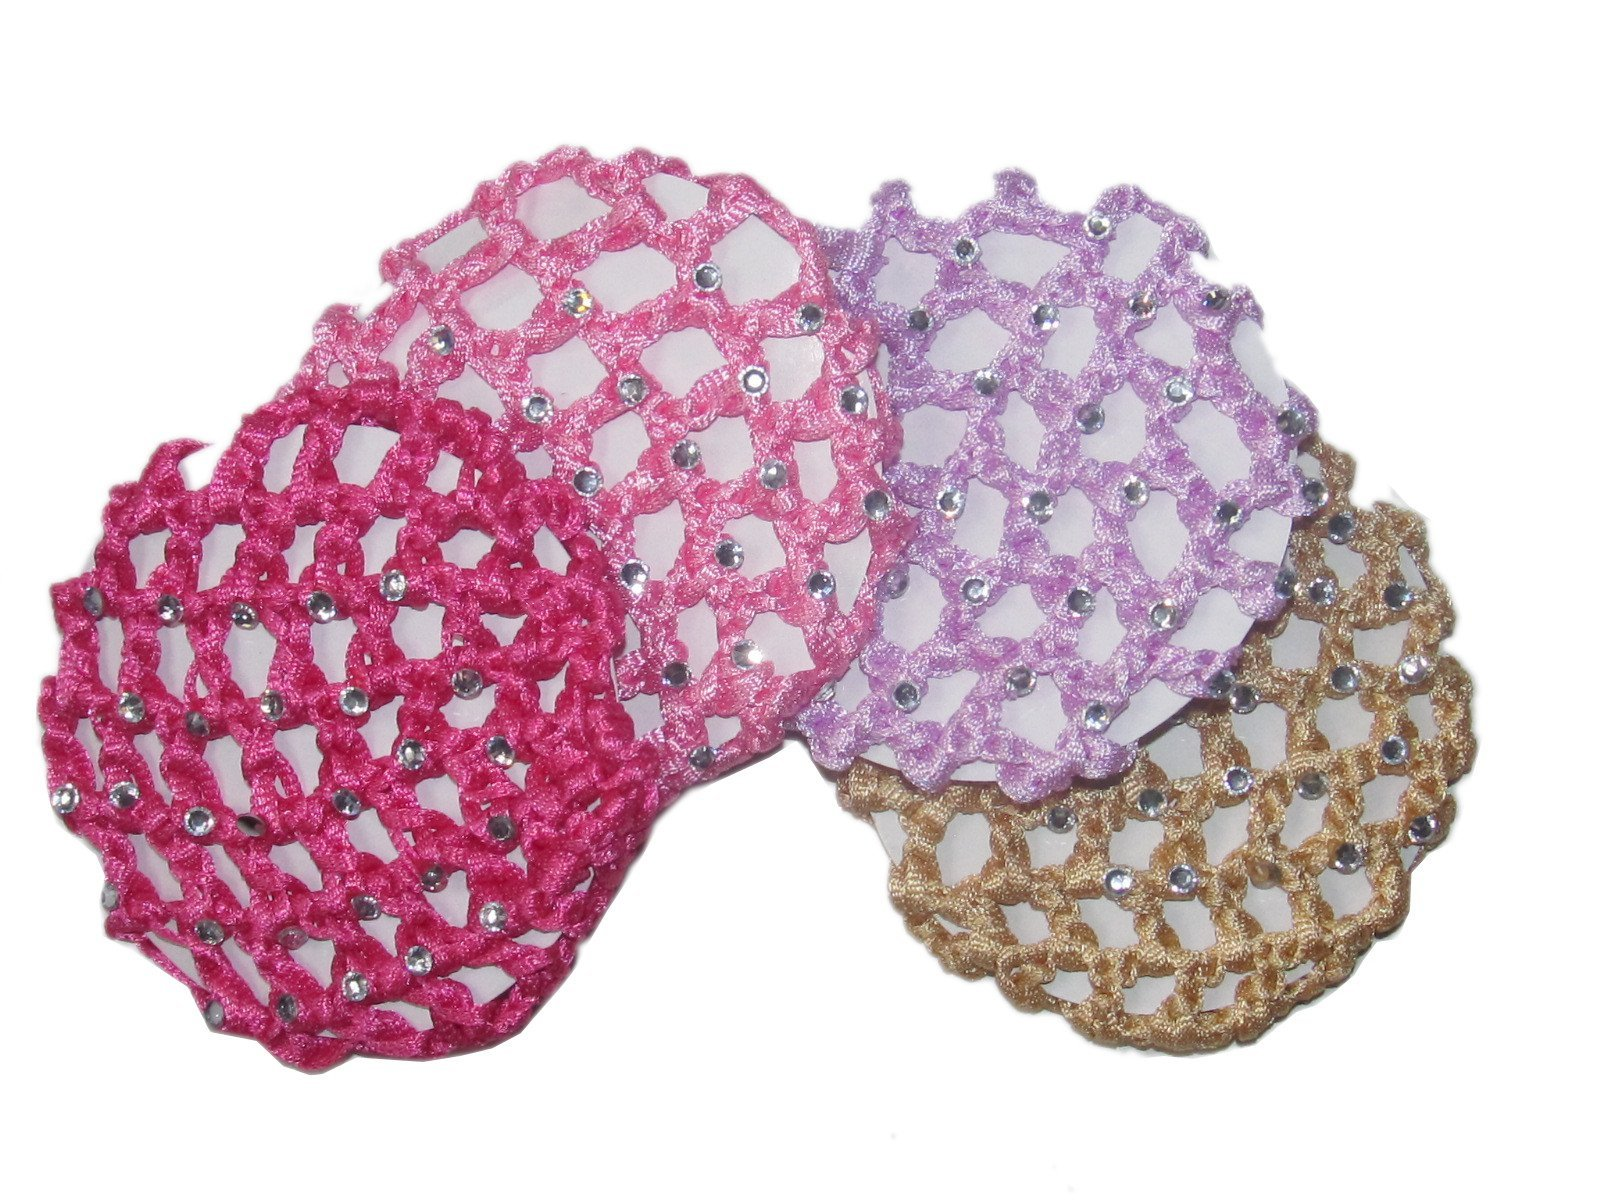 Ballerina Crochet Elastic Bun Cover W Rhinestones~ Choice of Colors (Set of 4)